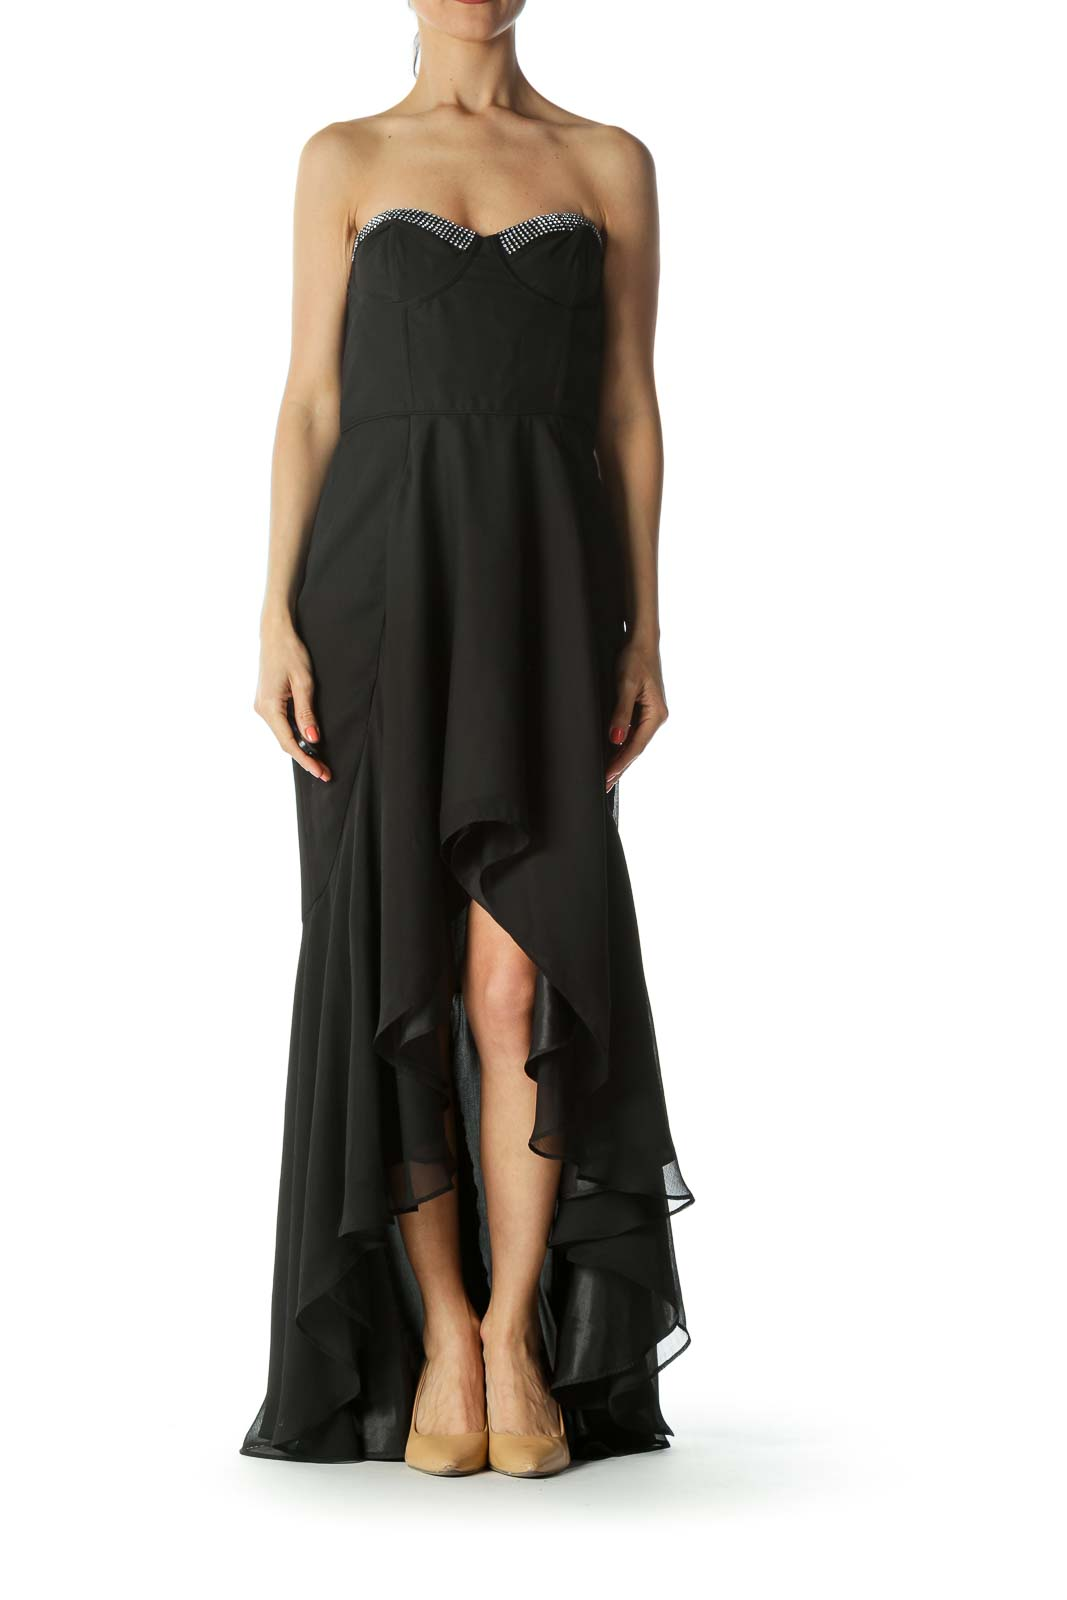 Black Rhinestones-Sweetheart-Neckline Inside-Upper-Body-Structure Dress